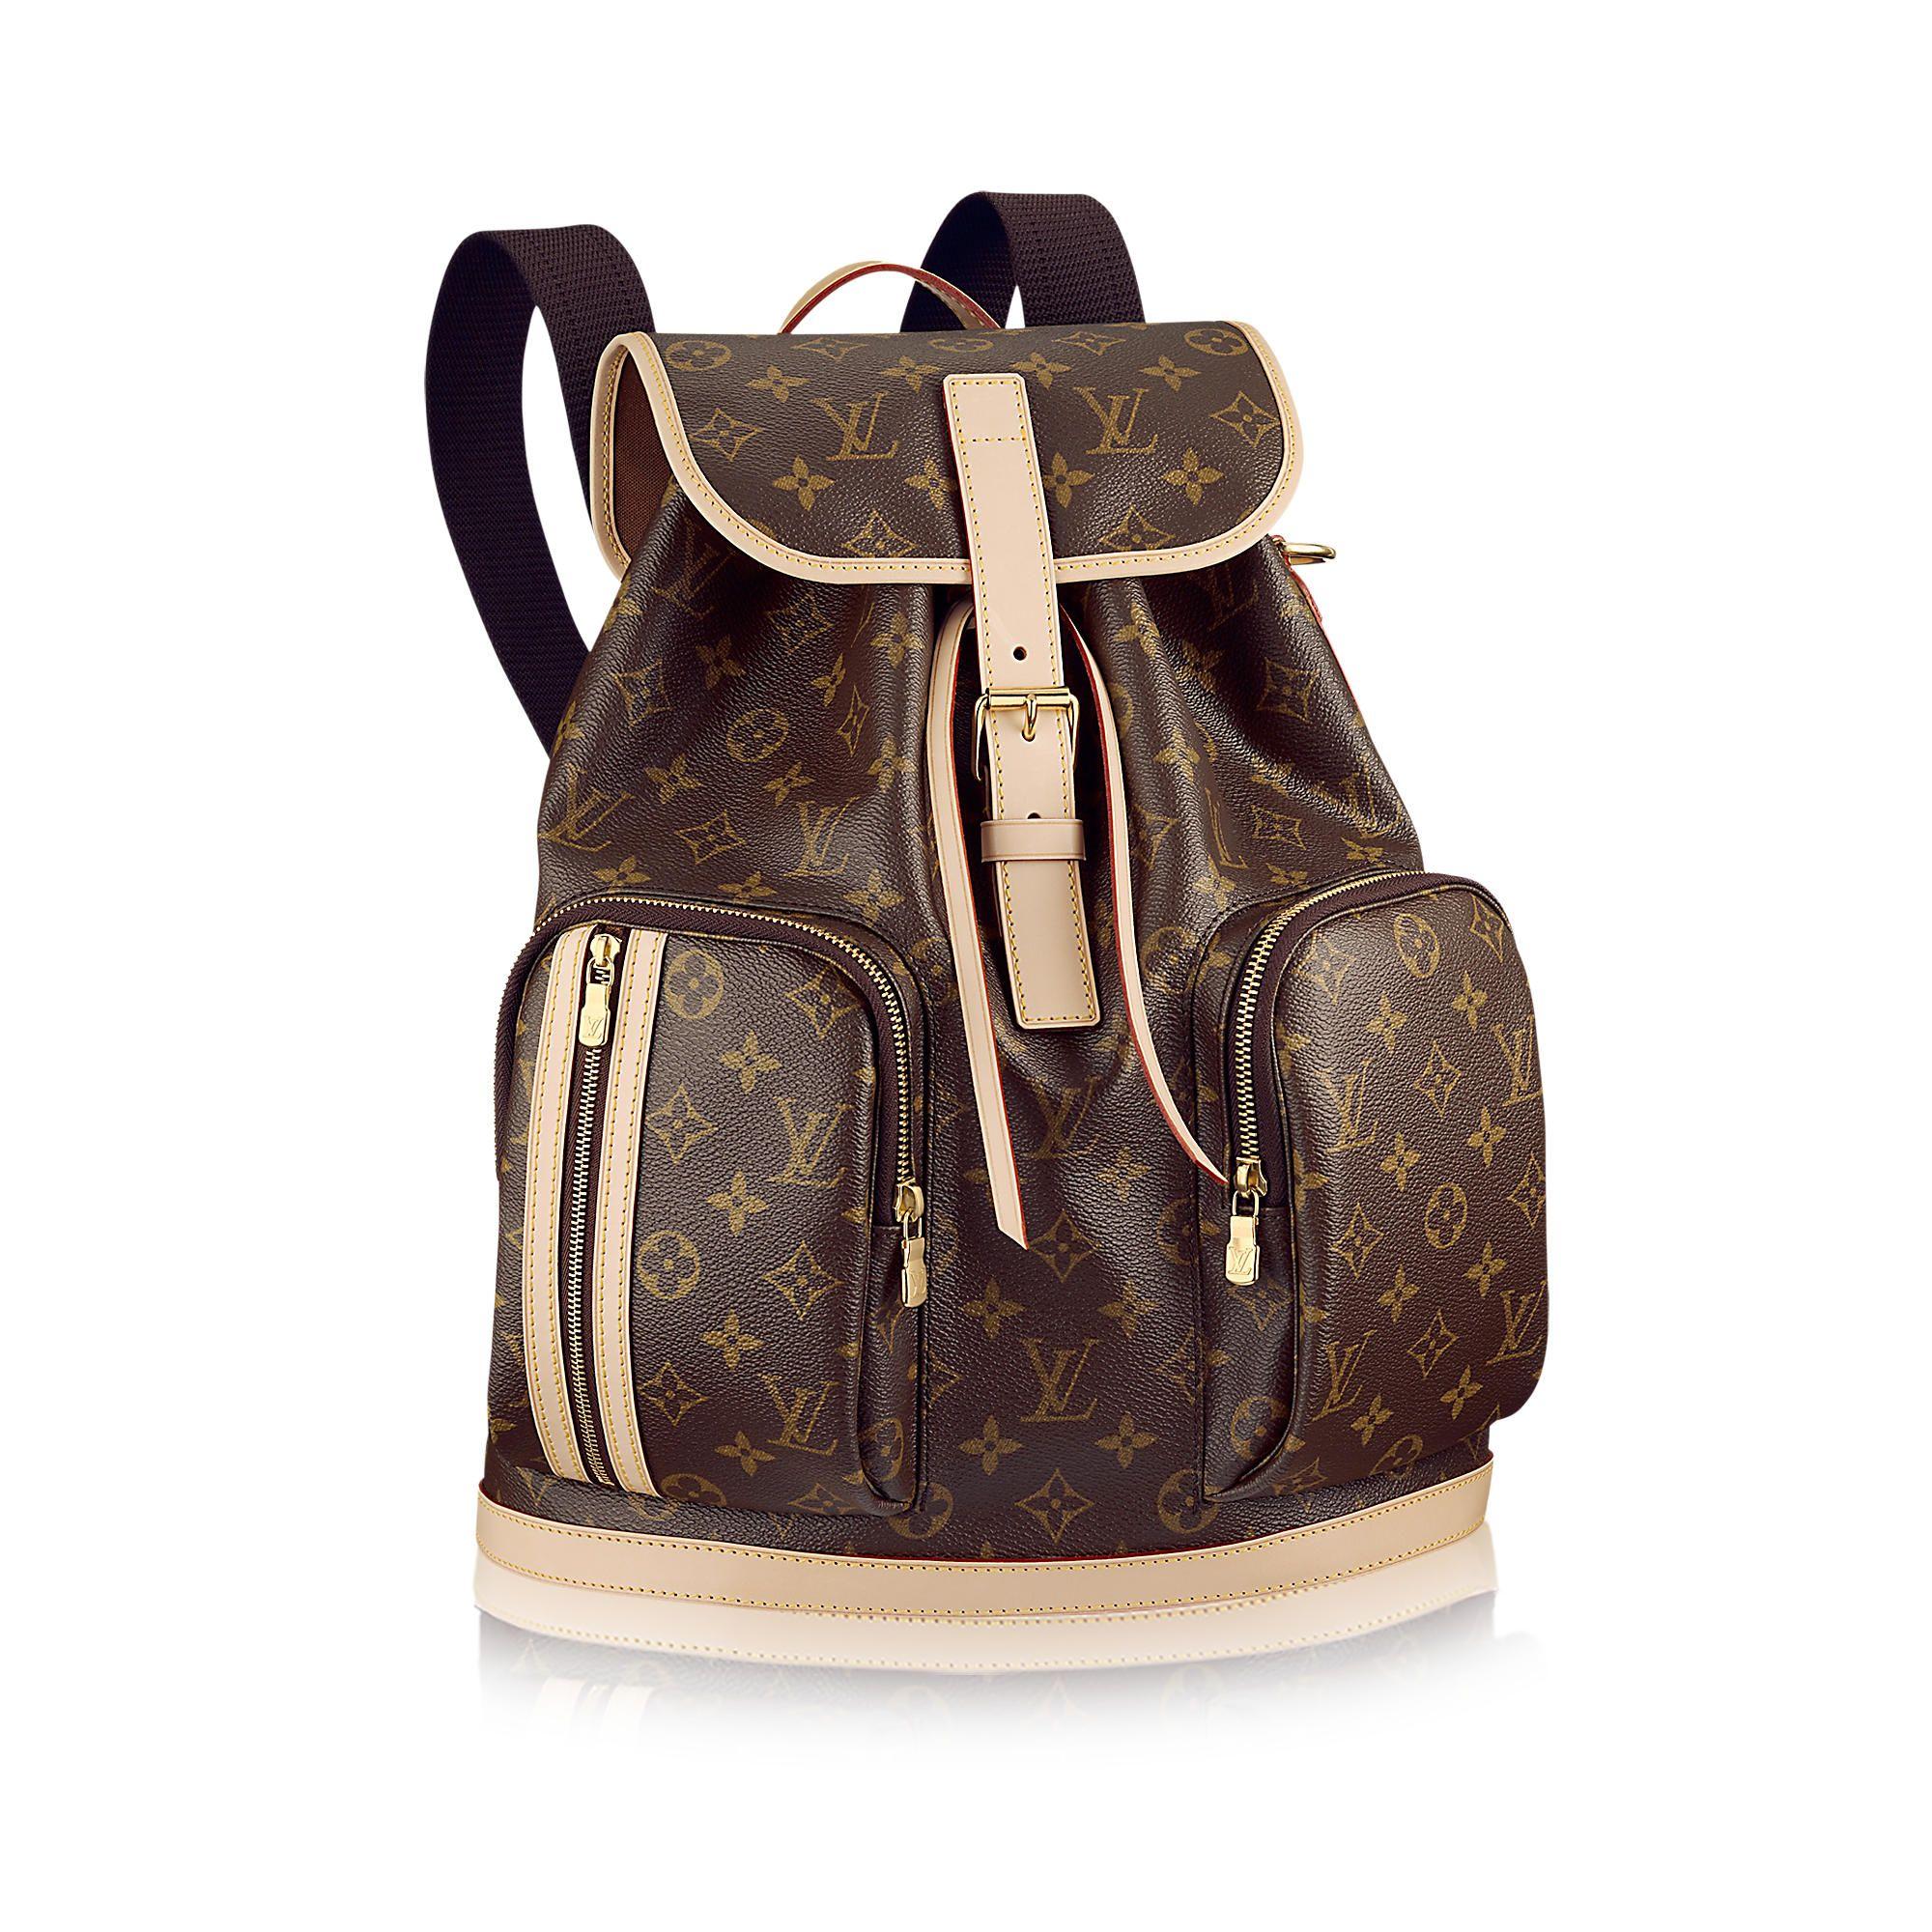 Louis Vuitton Rucksack Damen